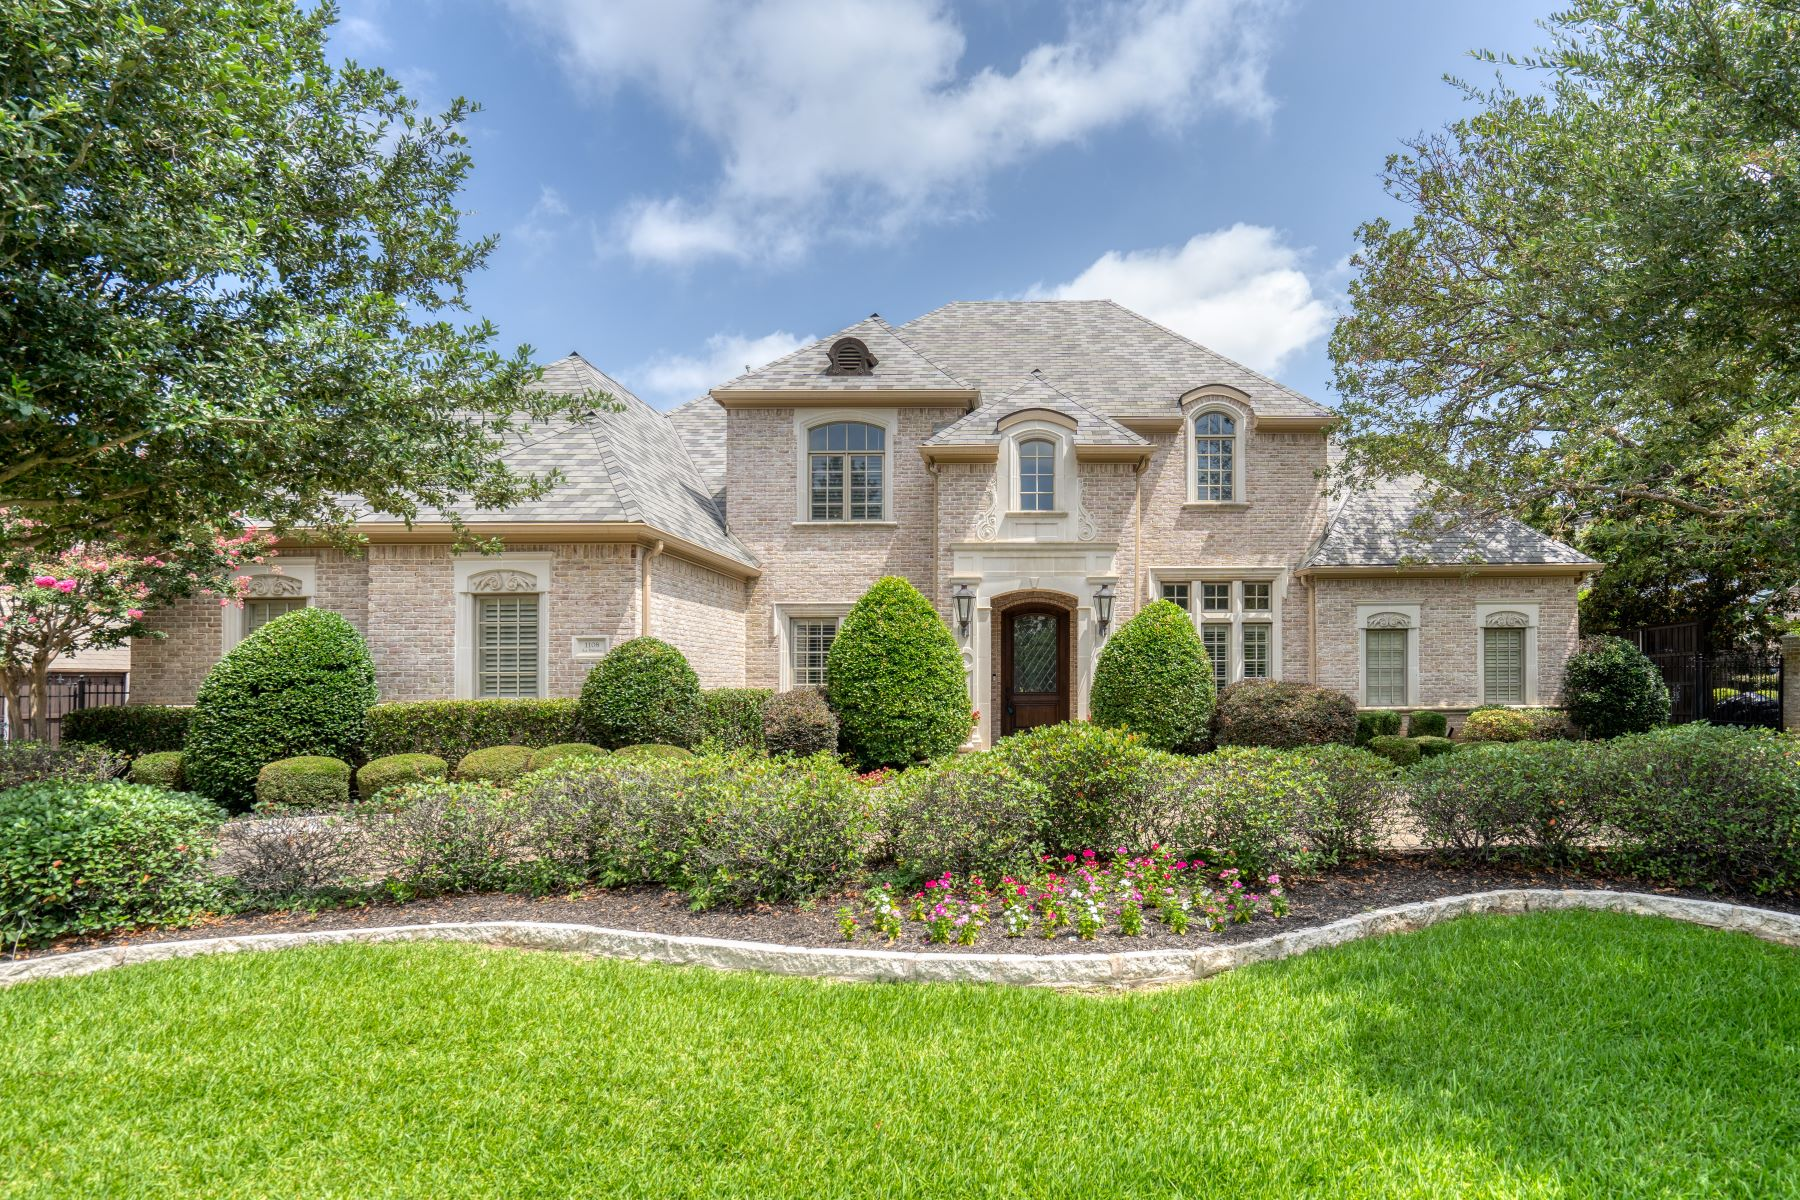 Single Family Homes for Sale at Private, Gated Lakes of La Paloma 1108 La Paloma Court Southlake, Texas 76092 United States